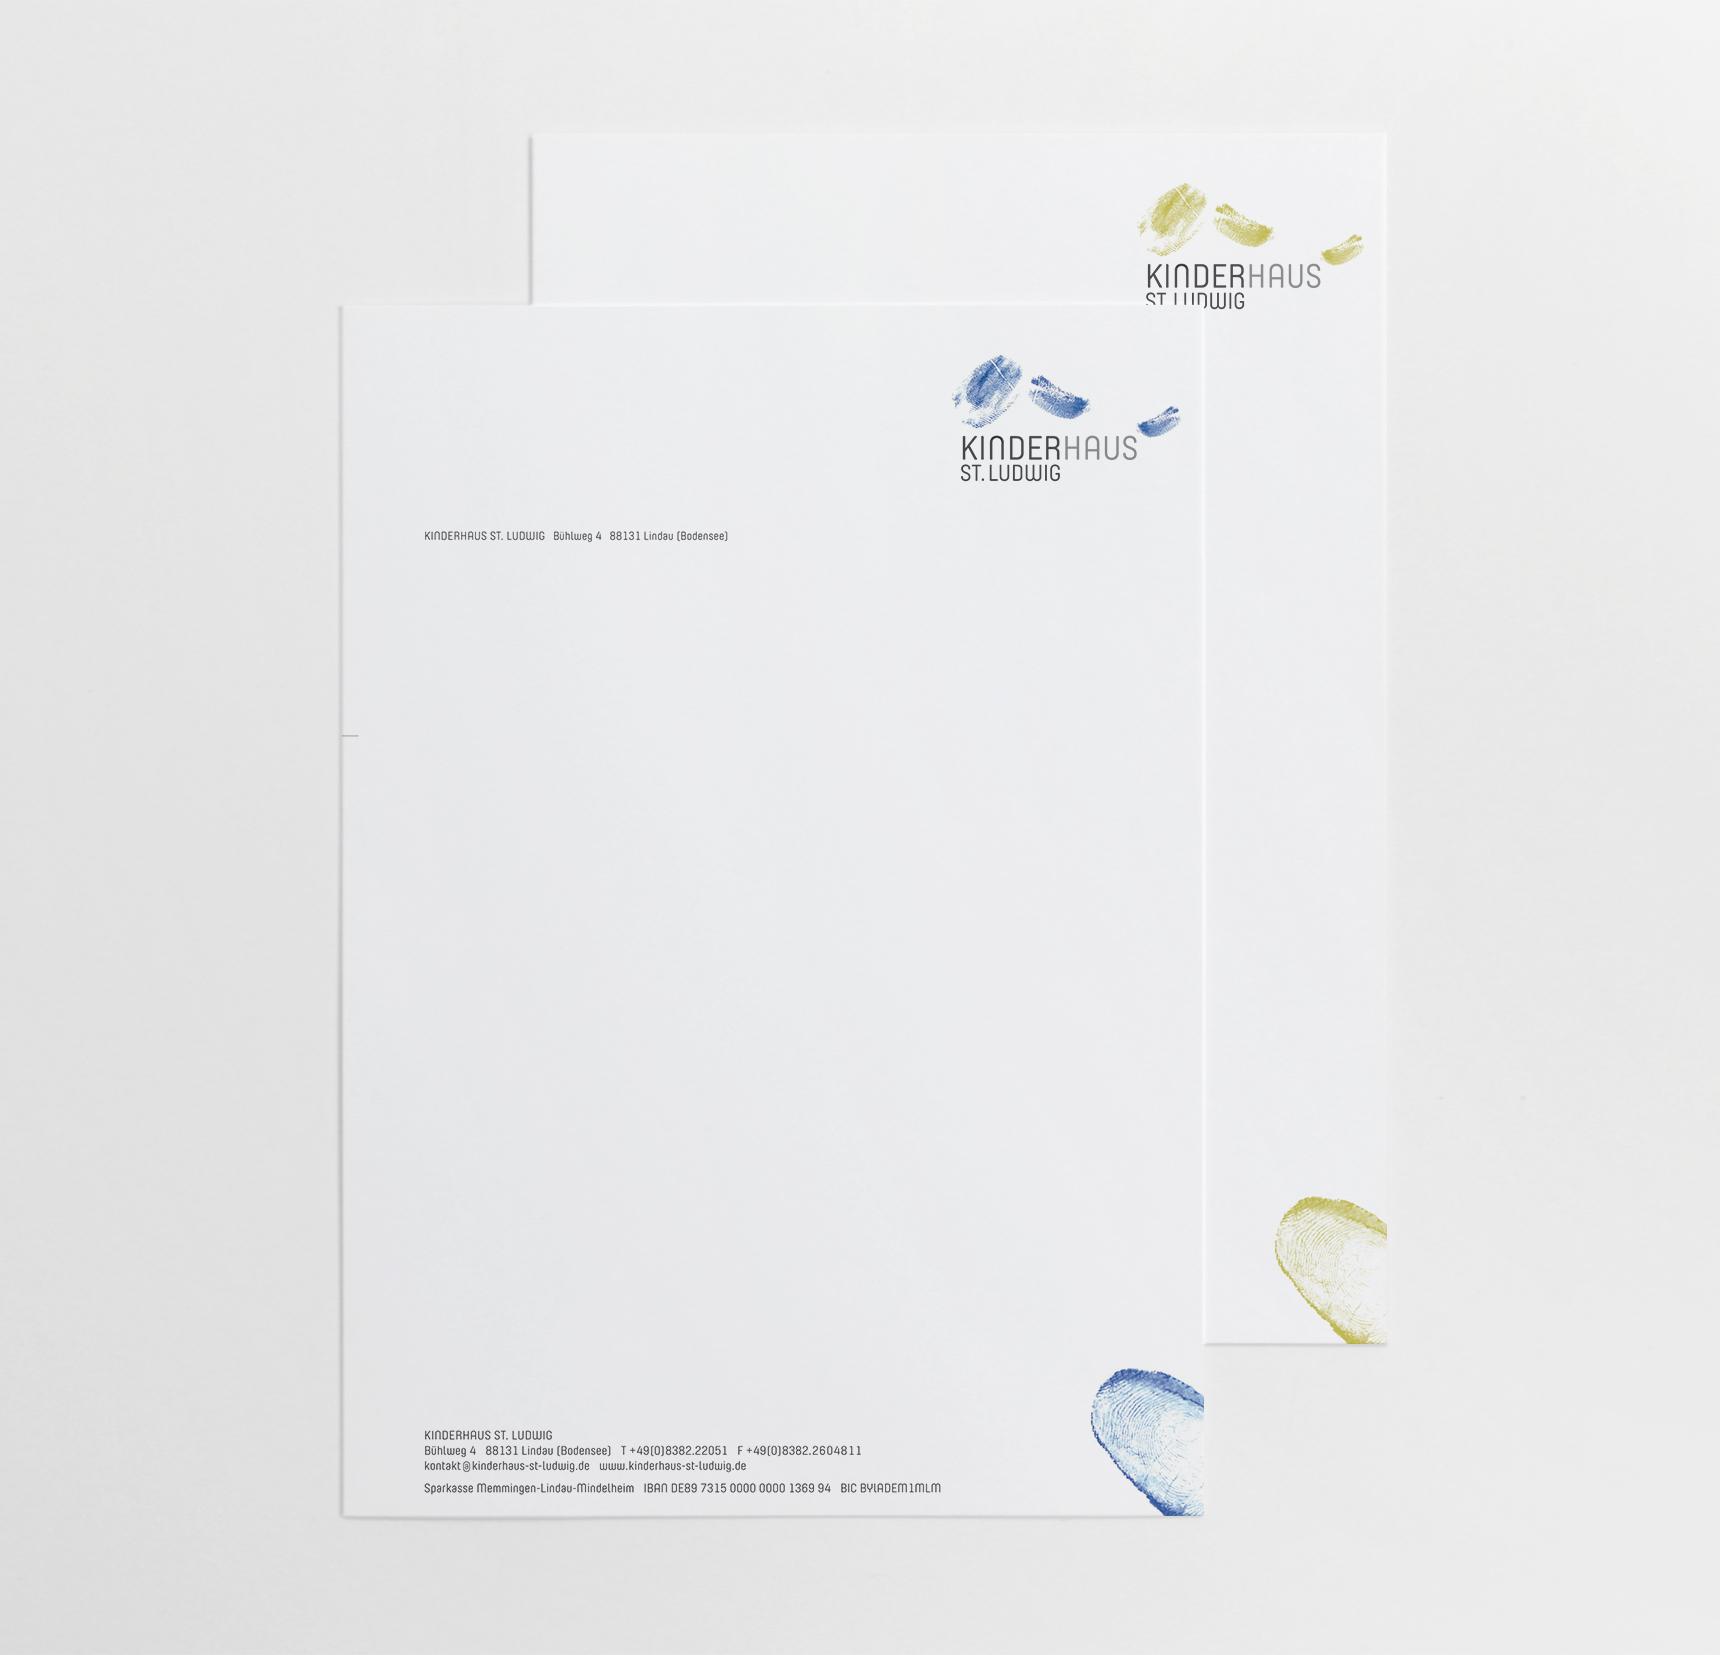 kh_briefpapierBrandDesign